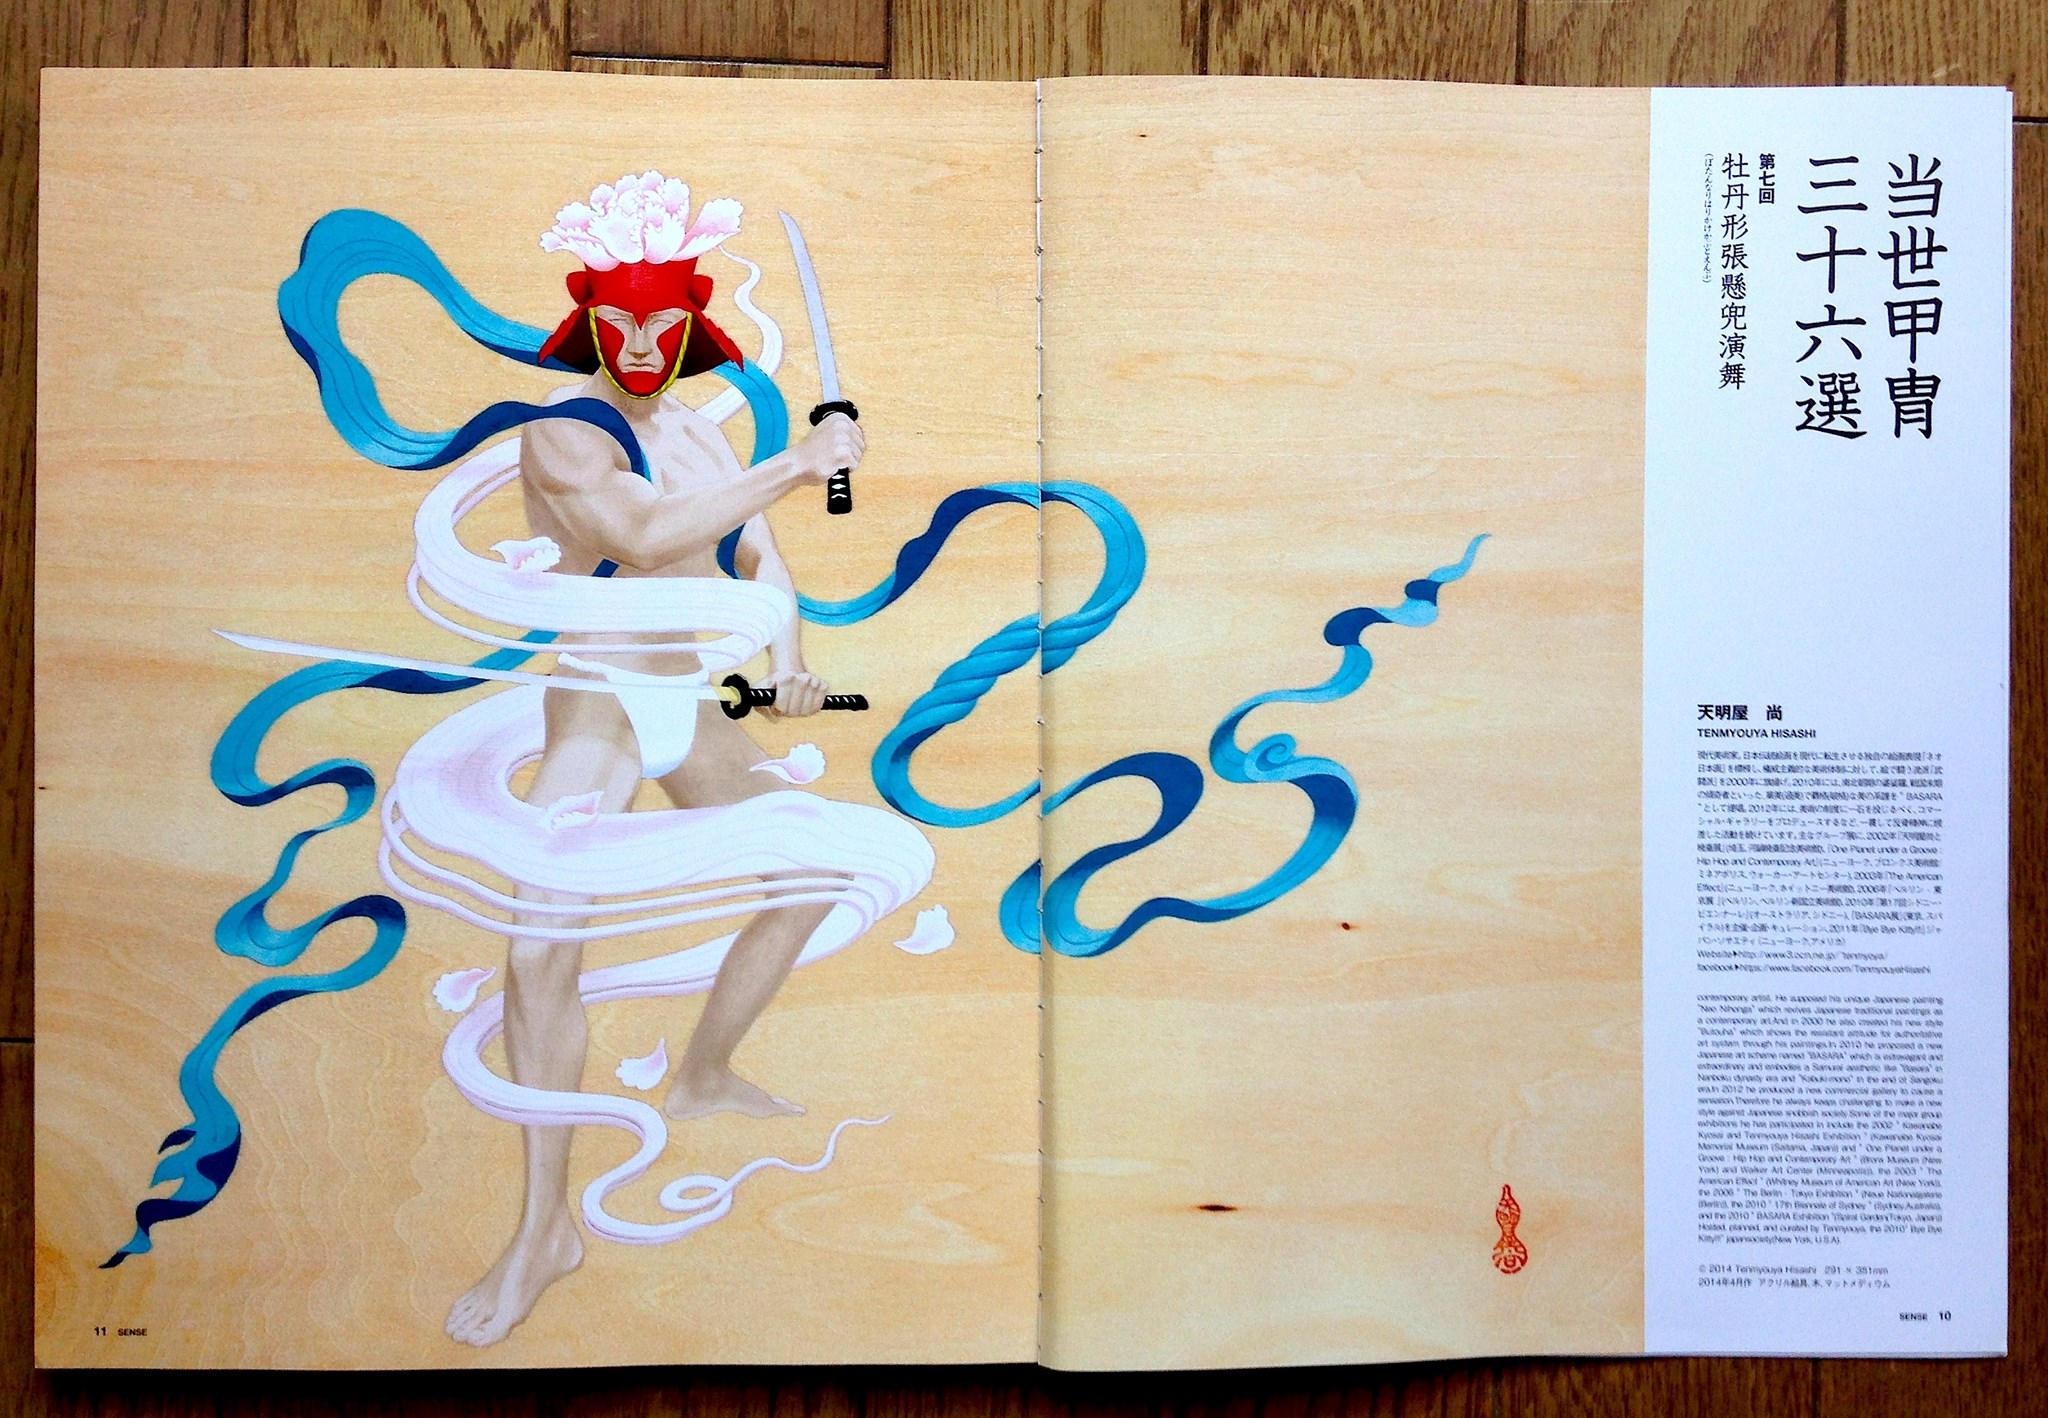 tenmyouya hisashi japanese painting 9